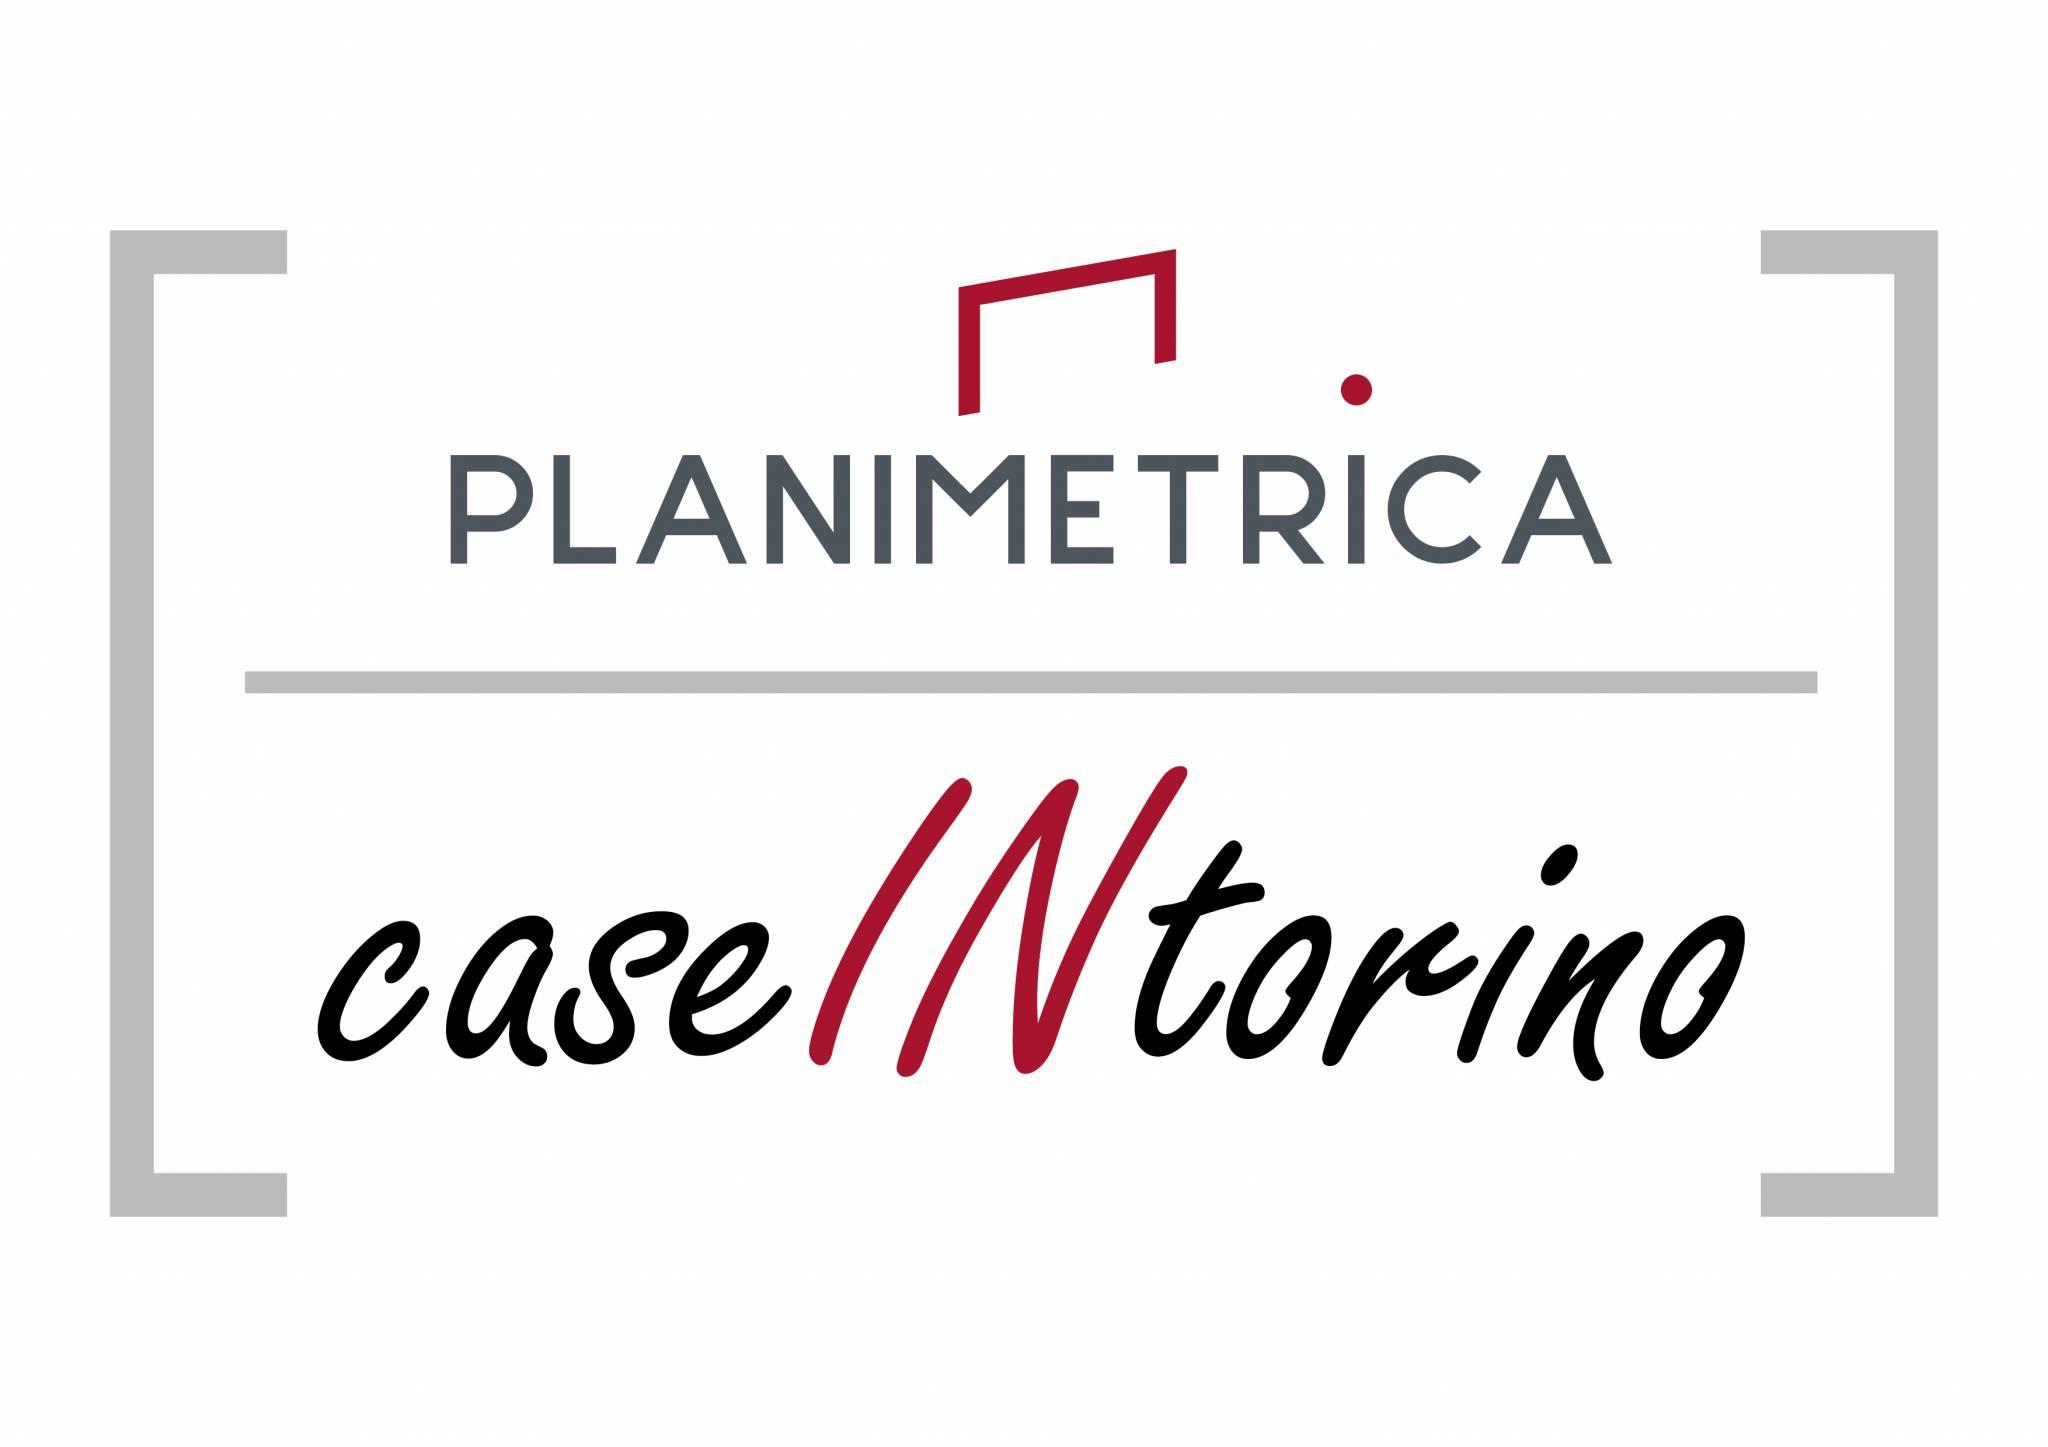 Agenzia Immobiliare Caseintorino Gruppo Planimetrica, Via Vassalli Eandi (Zona Cit Turin), 26 Torino (TO)